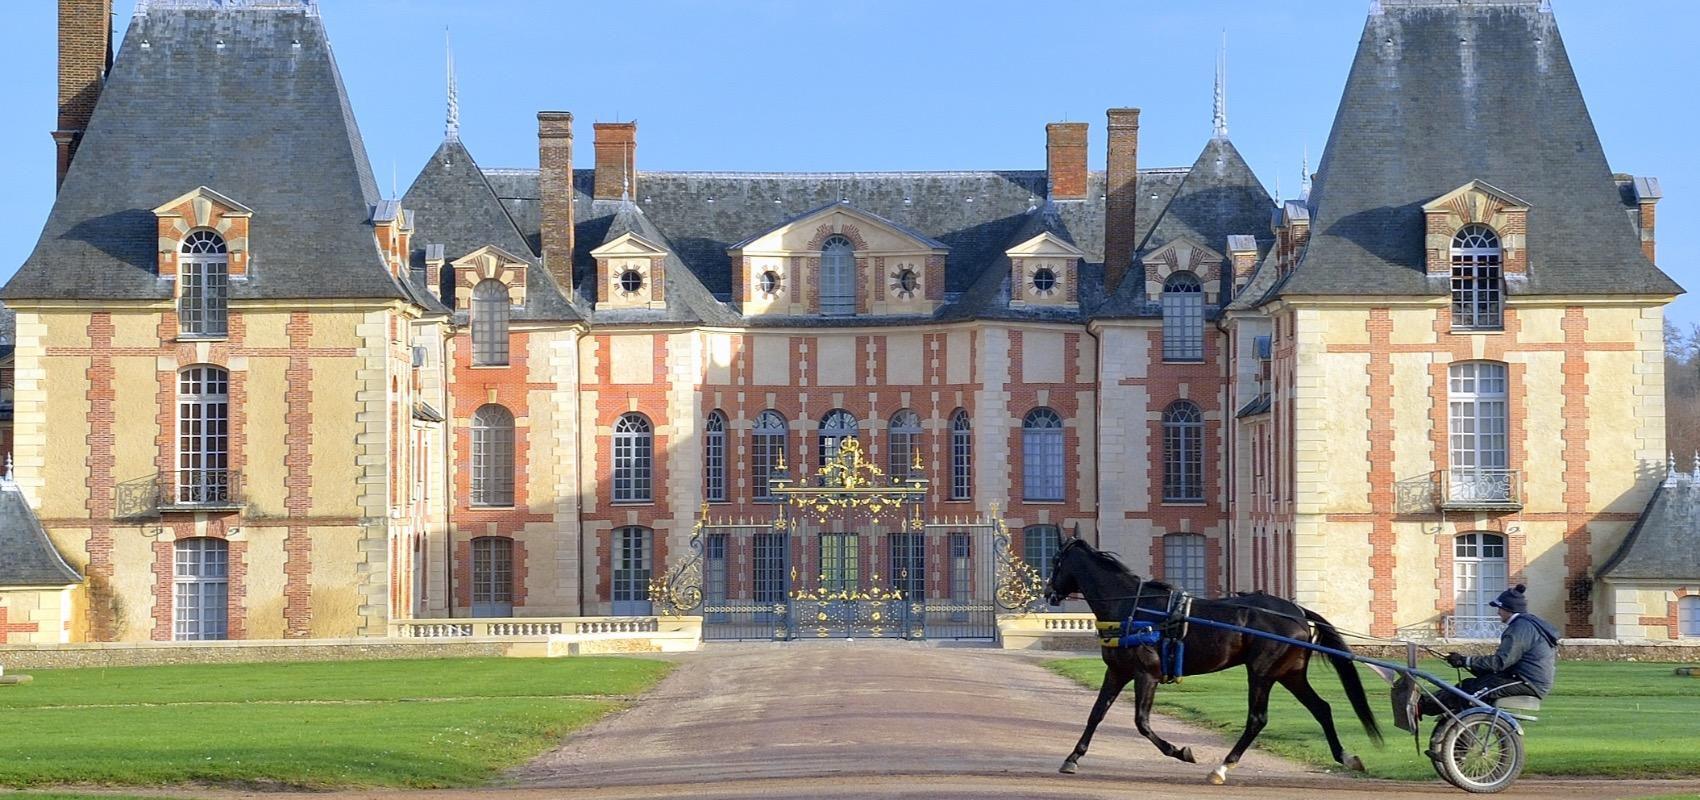 Grosbois, an estate dedicated to Trotting